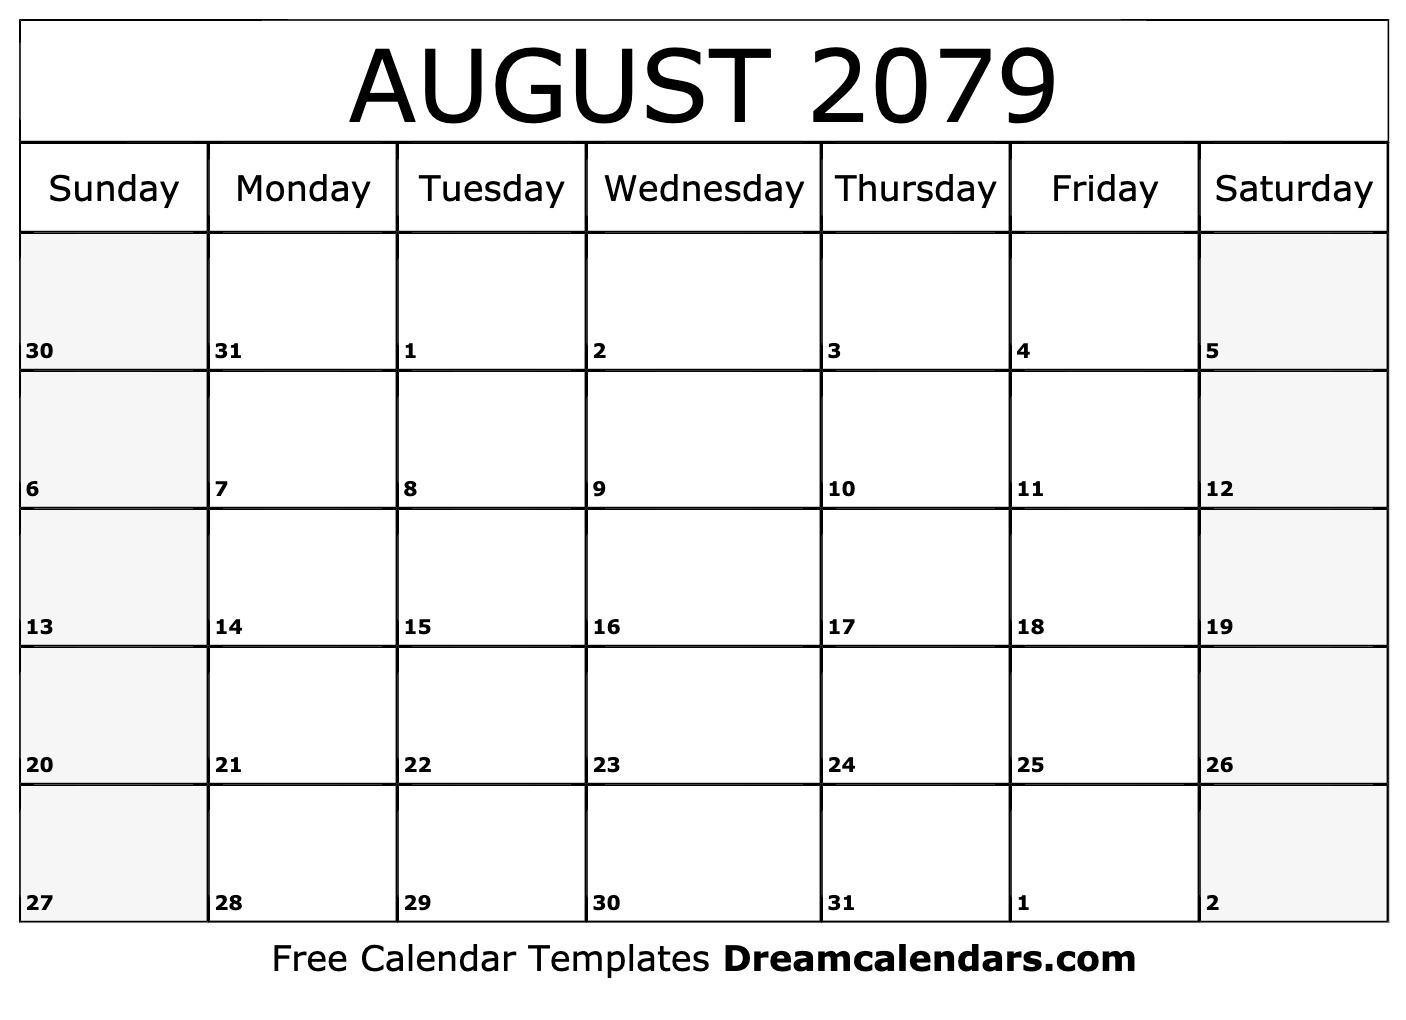 Free Blank August 2079 Printable Calendar